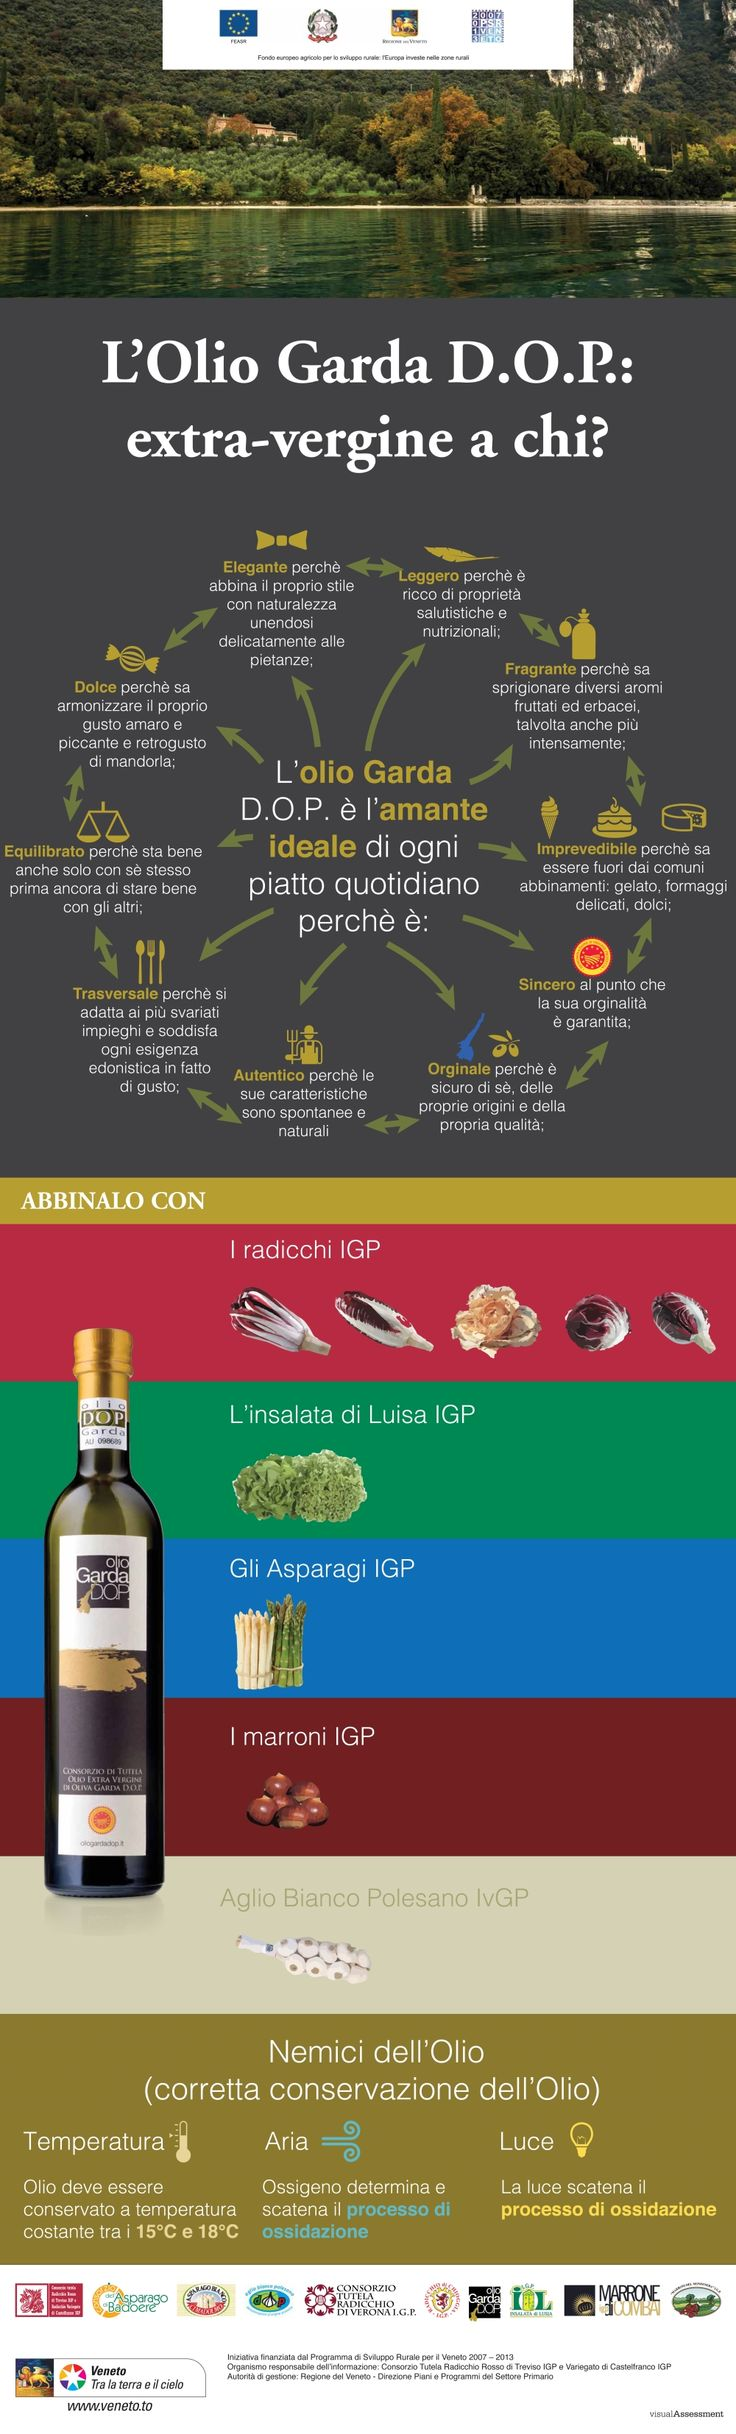 olio garda dop infografica 5